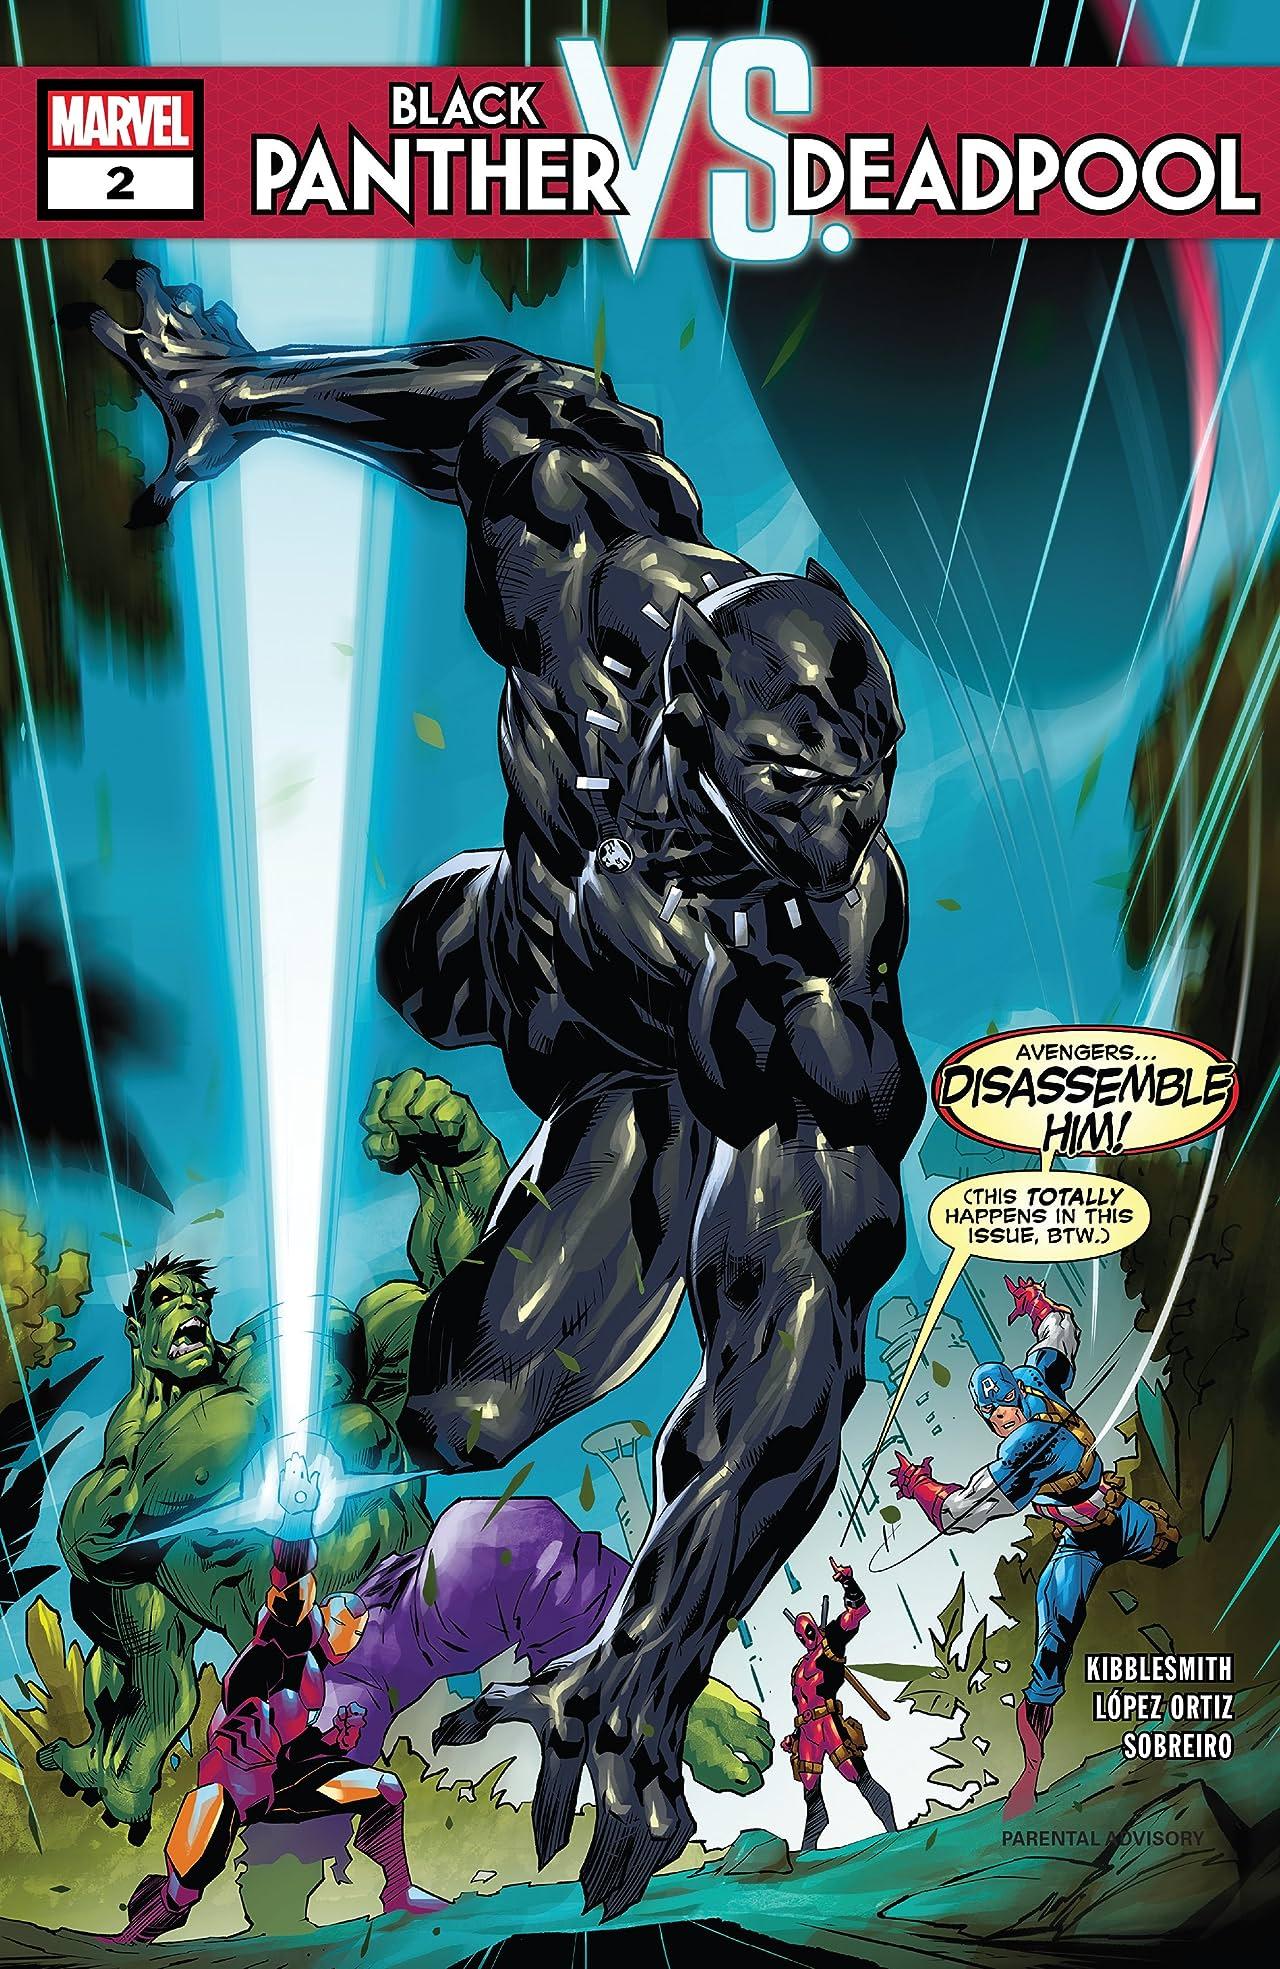 Black Panther vs. Deadpool (2018-2019) #2 (of 5)